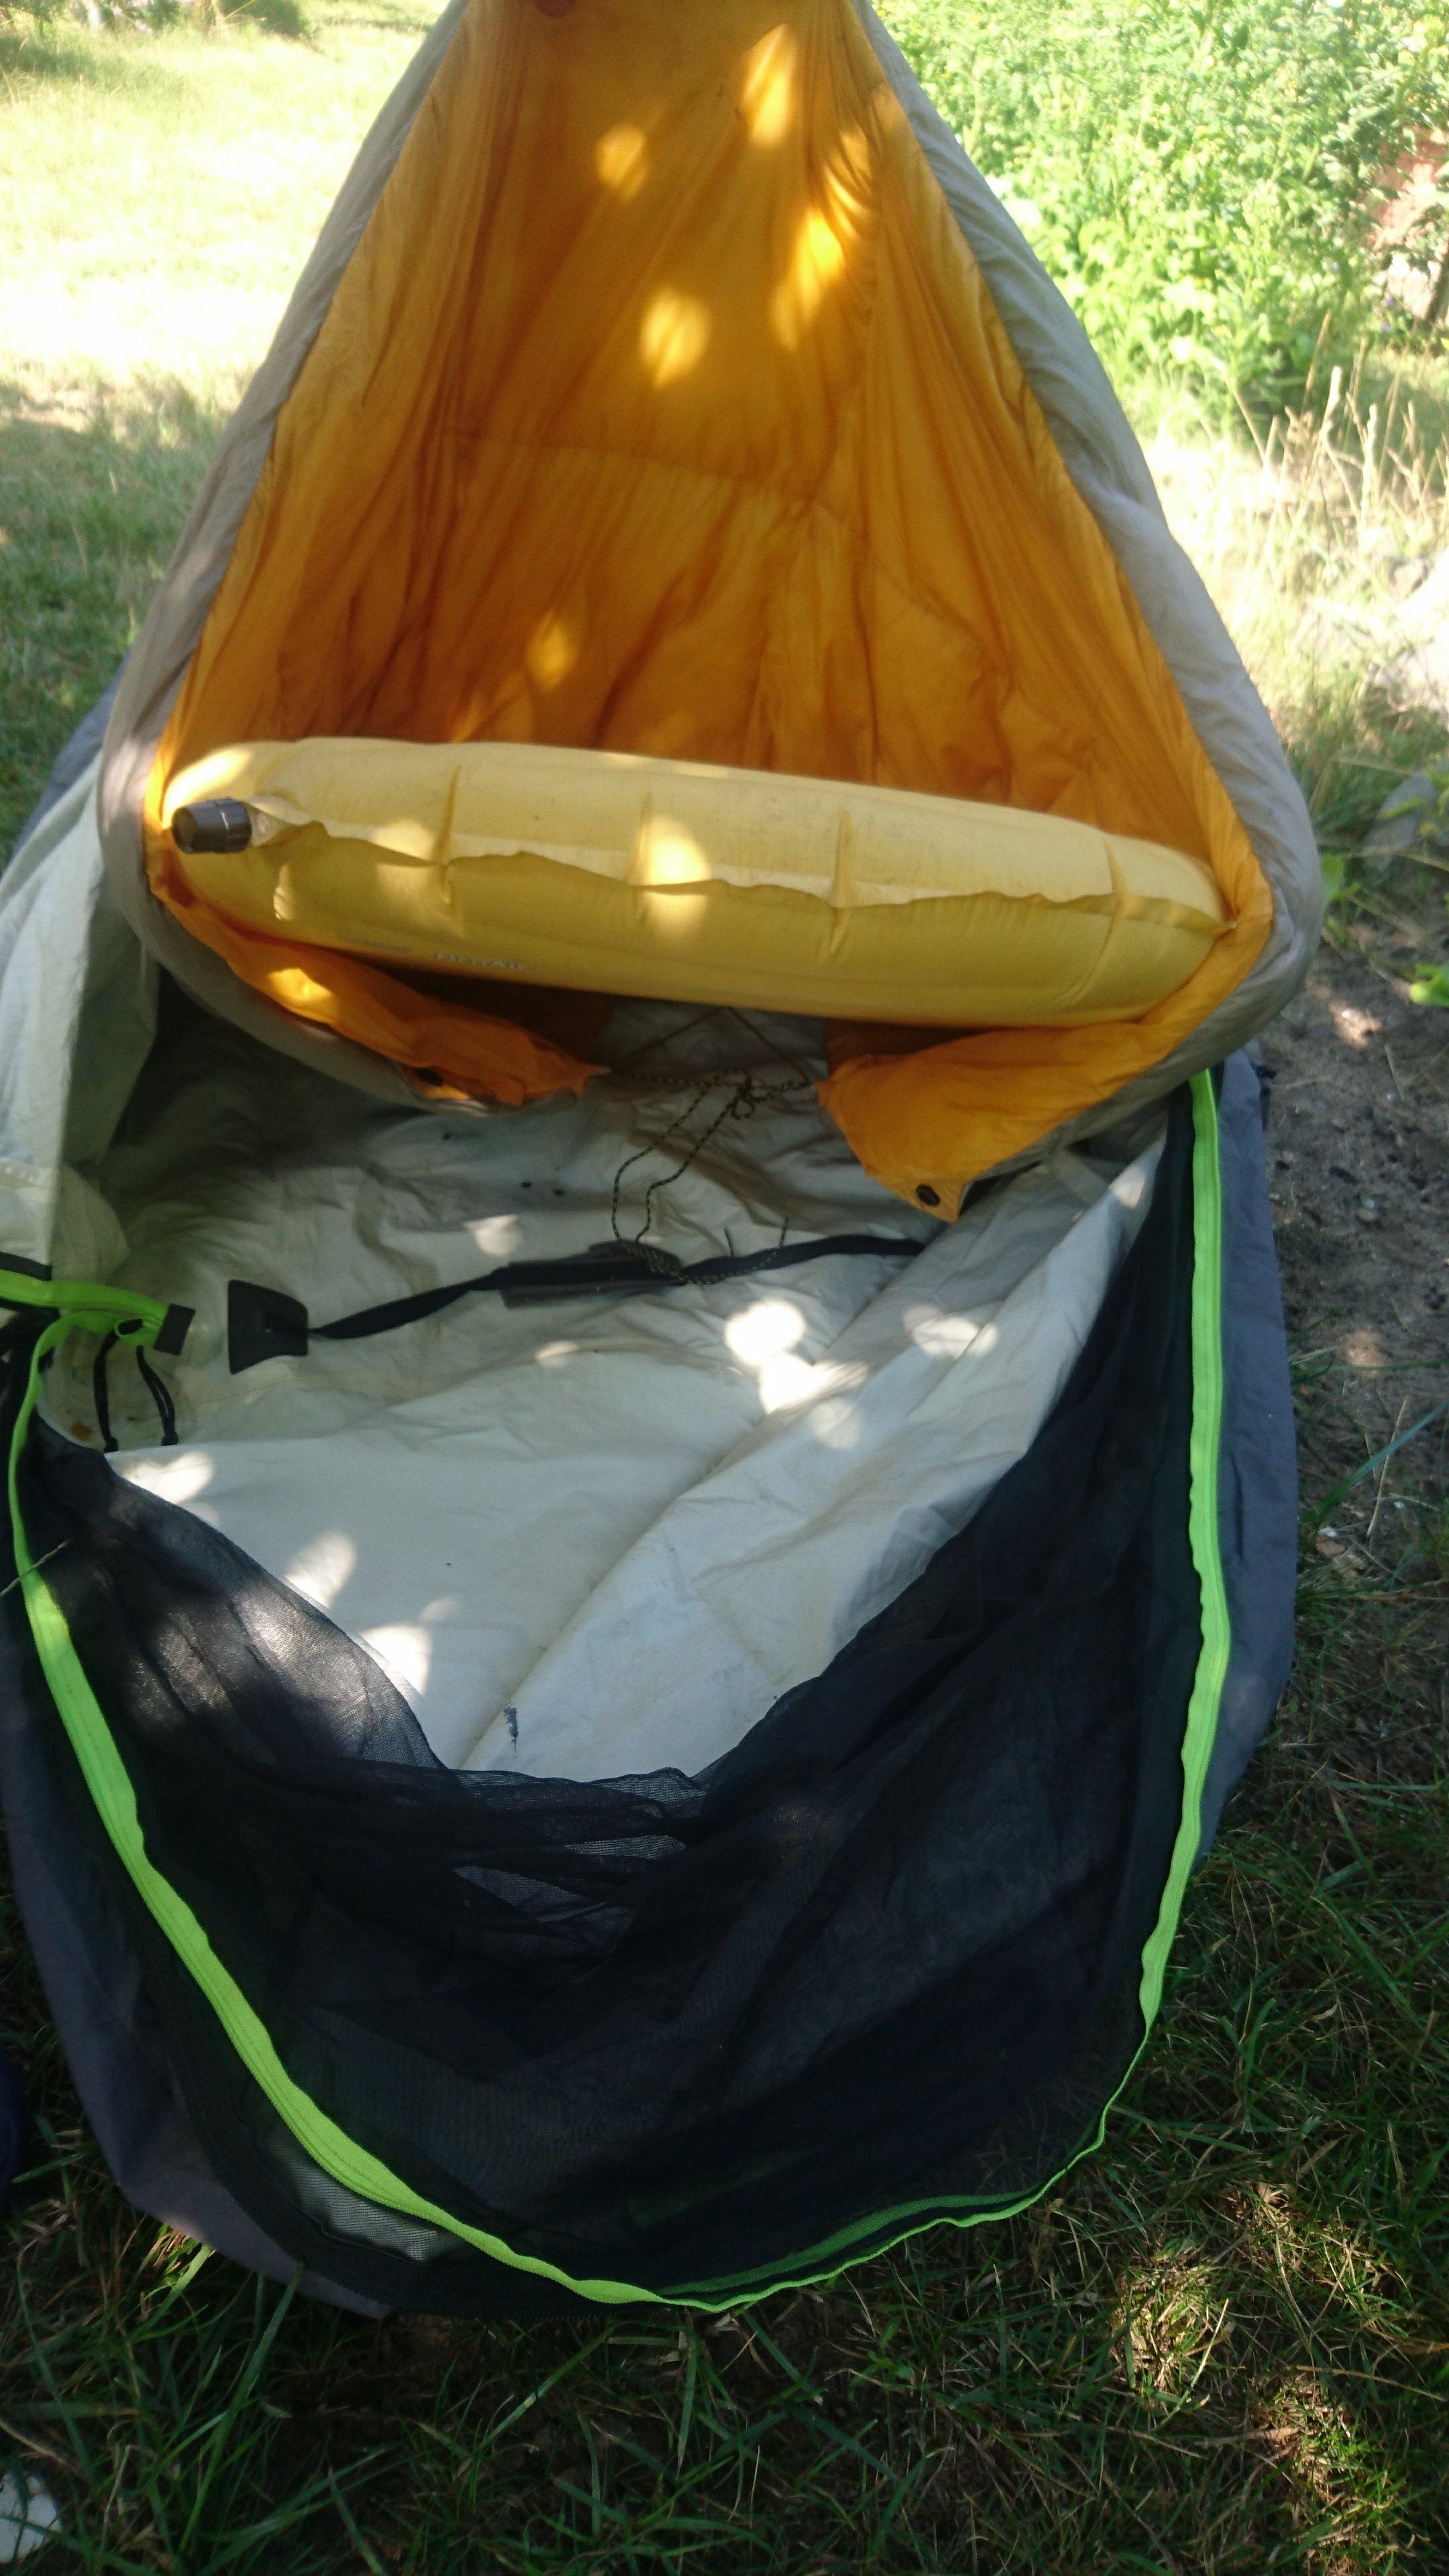 Pad inside bag inside bivy